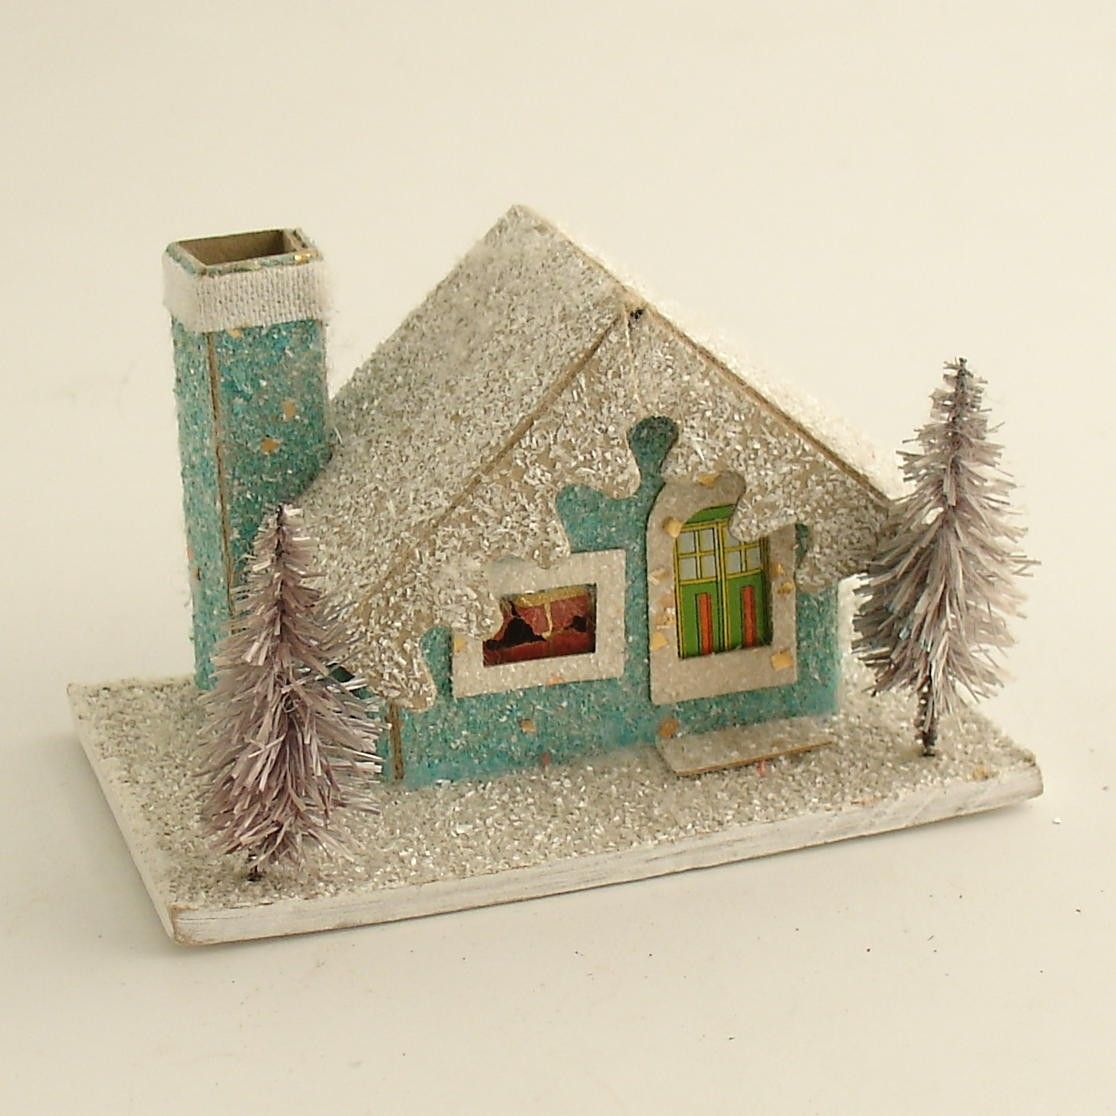 Vintage Christmas Mica Putz House W Bottle Brush Trees Village Etsy Vintage Christmas Decorations Putz Houses Vintage Christmas